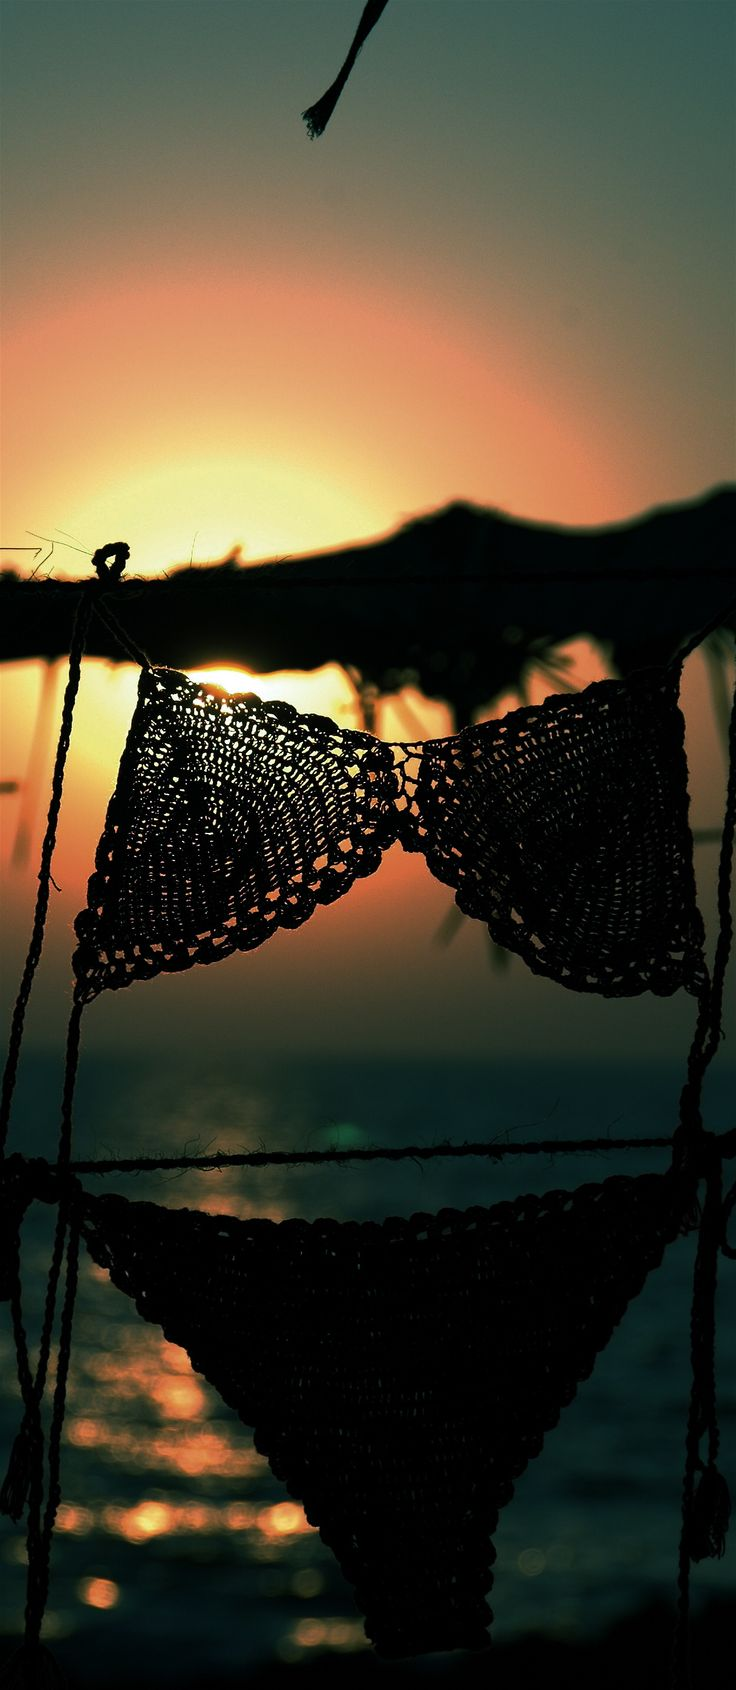 Bikini's and the sunset - At the Anjuna Flea Market